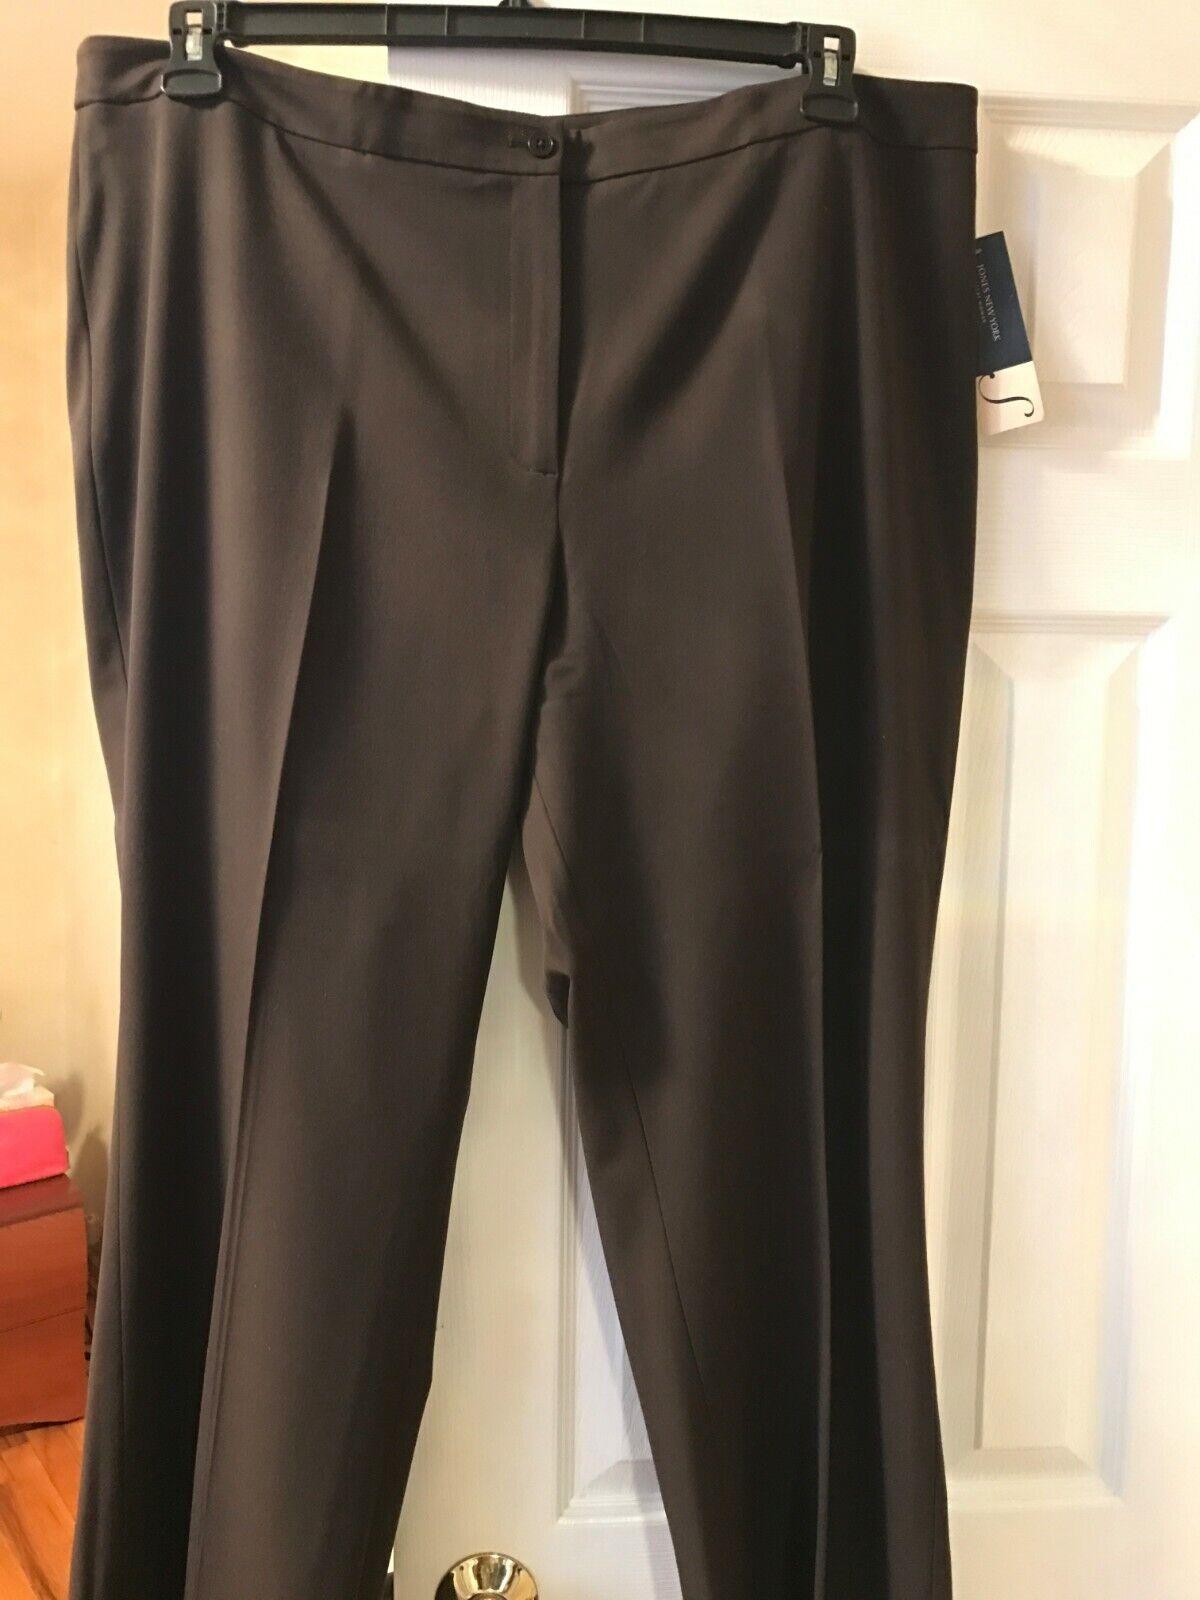 NWT  95 Jones New York Wide Leg Pants in Dark Chocolate Size 22W.